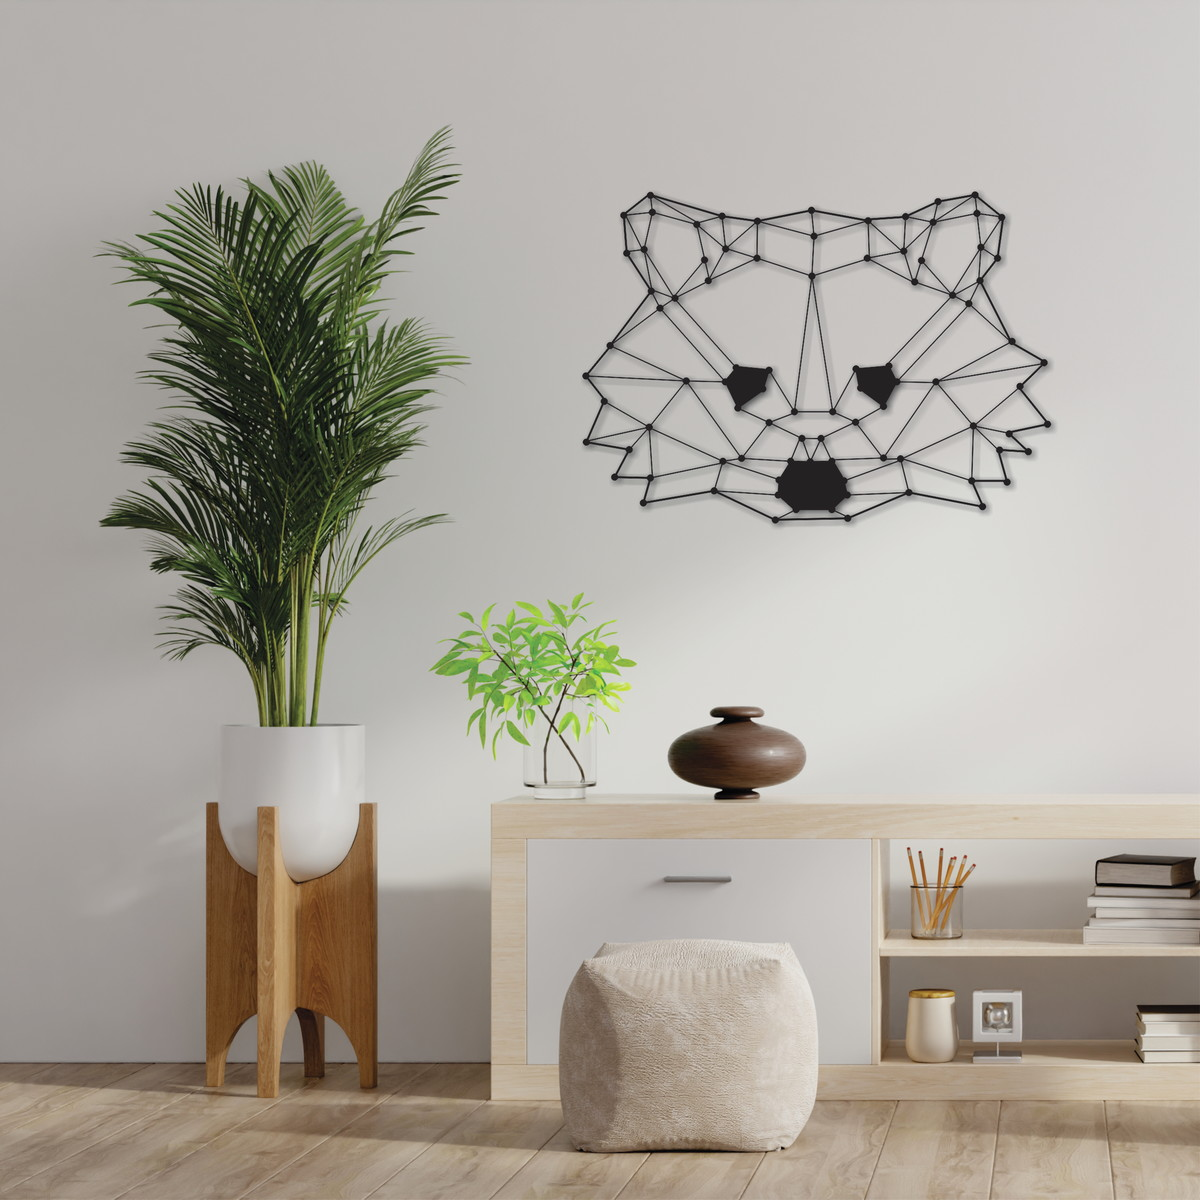 Polygon Raccoon Wall Art Free DXF File